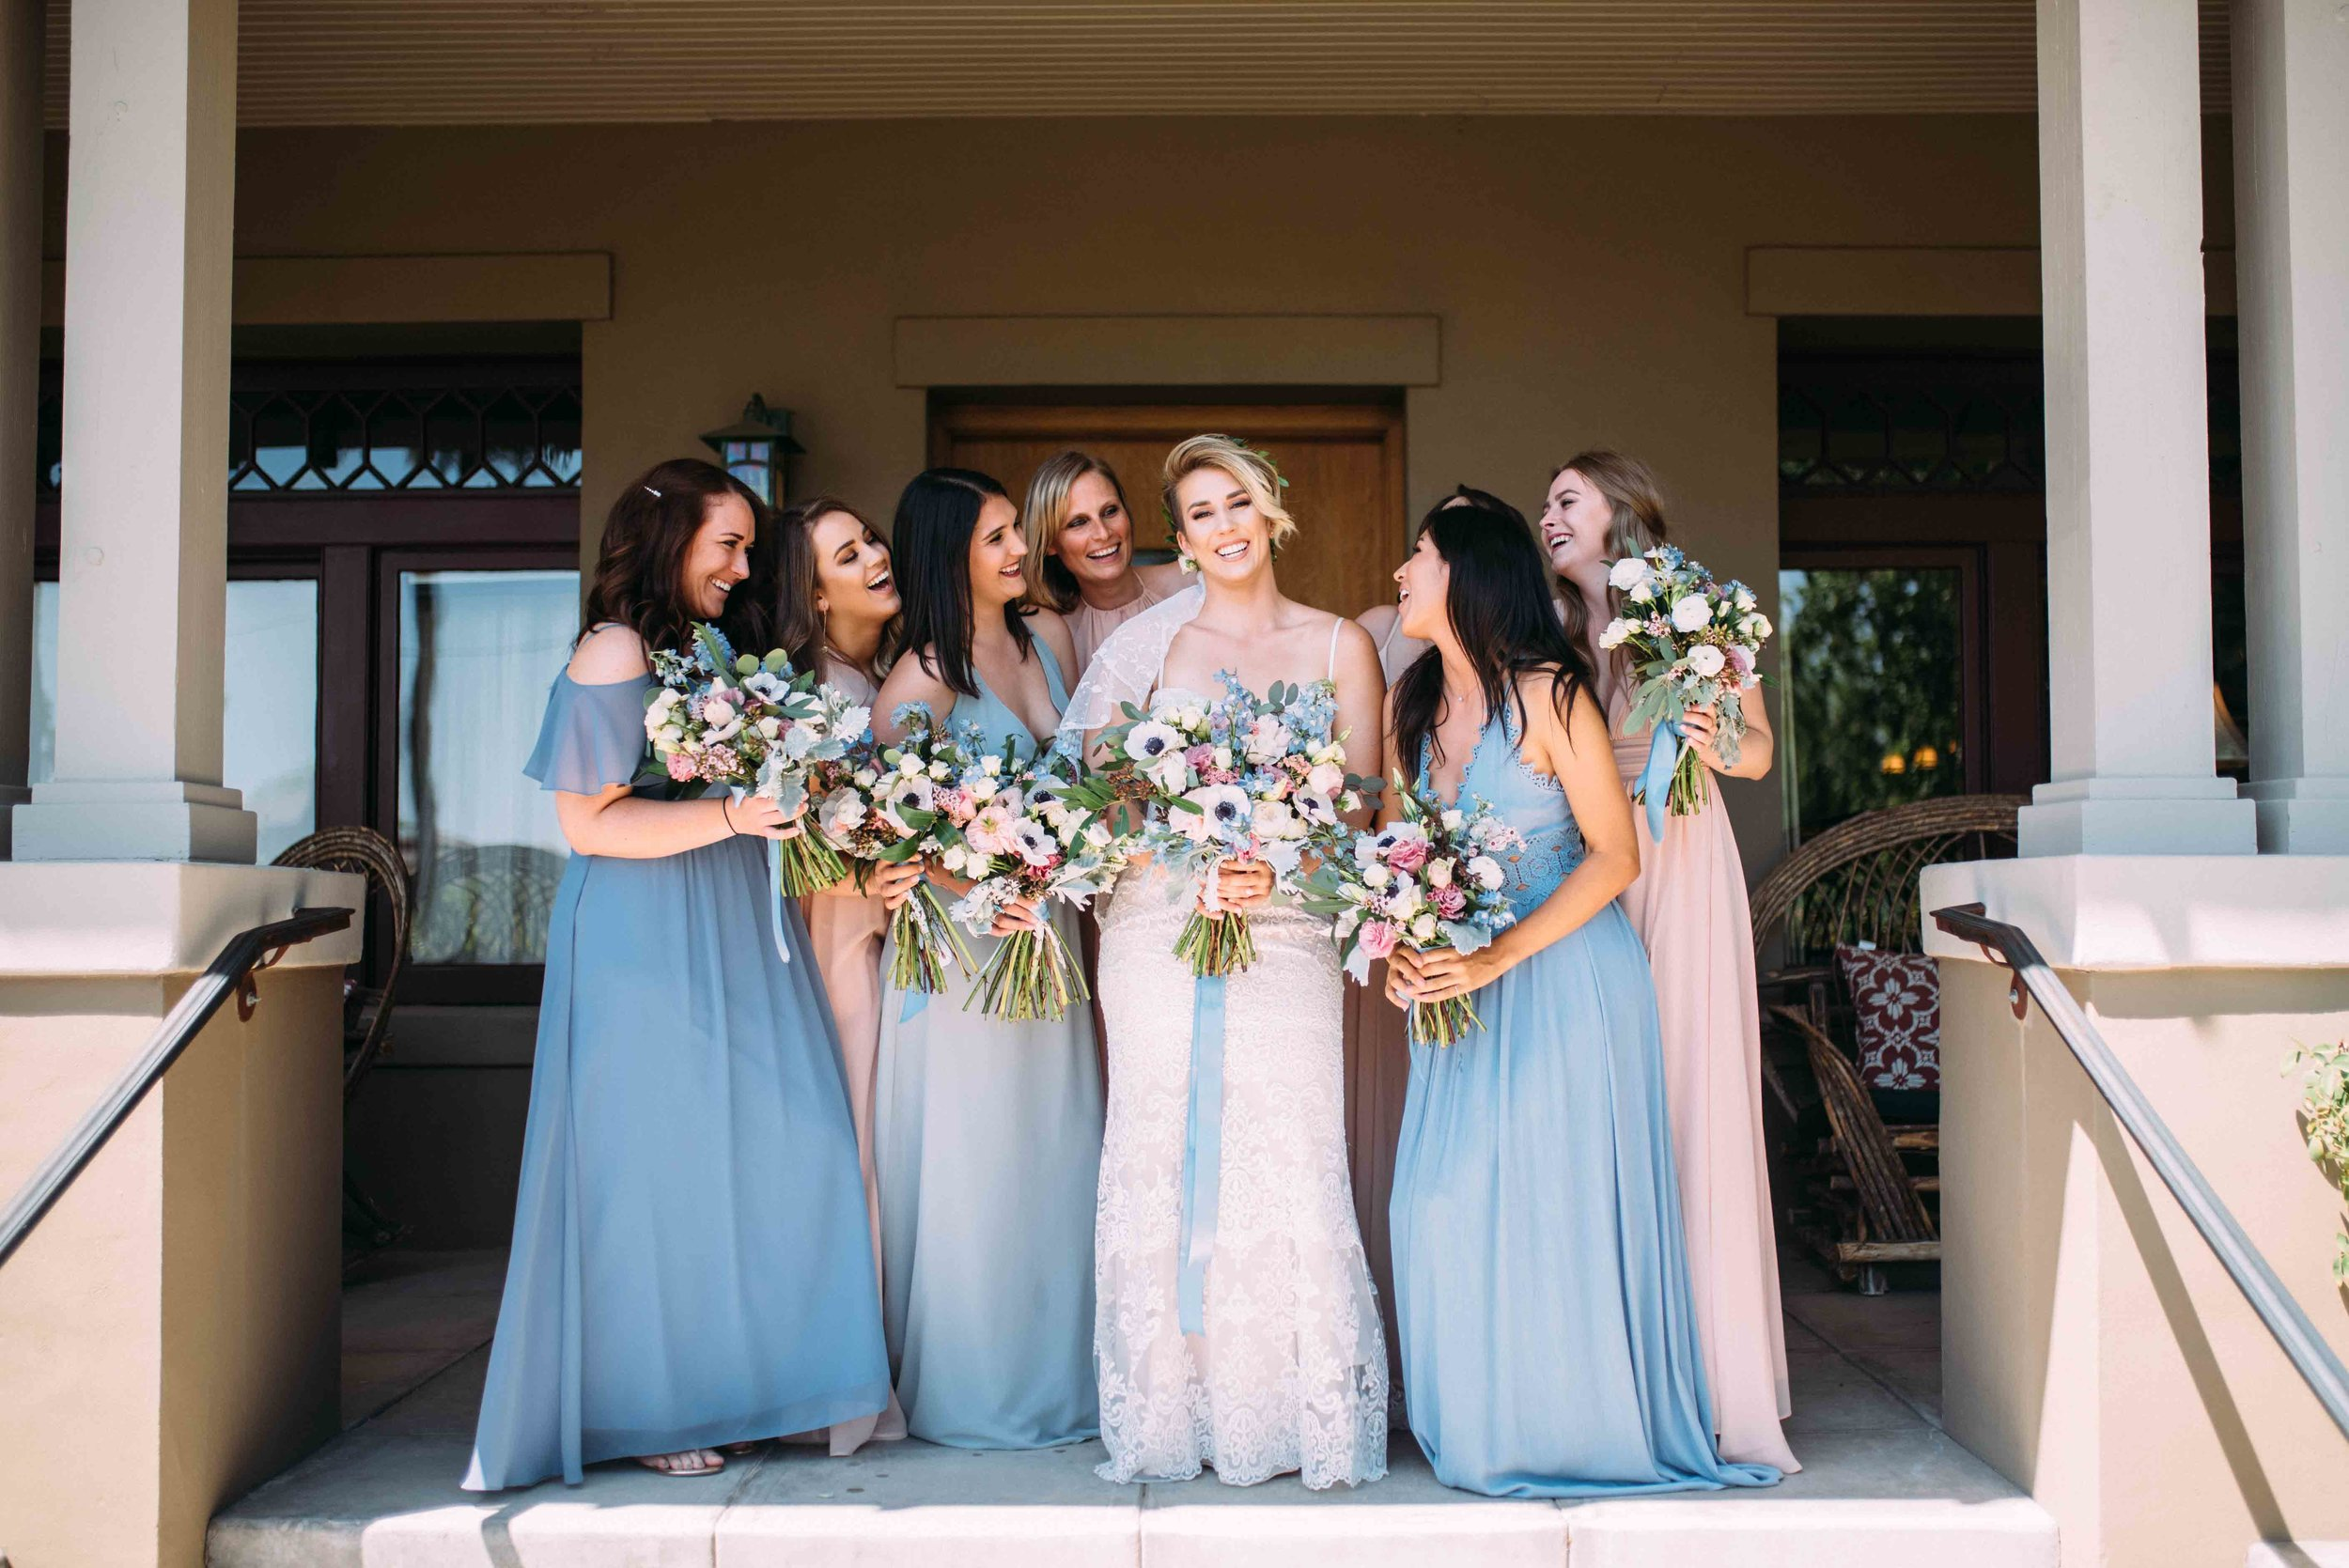 Phoenix_Arizona_Wedding_Blog_AlyssaRyanPhotography18.jpg